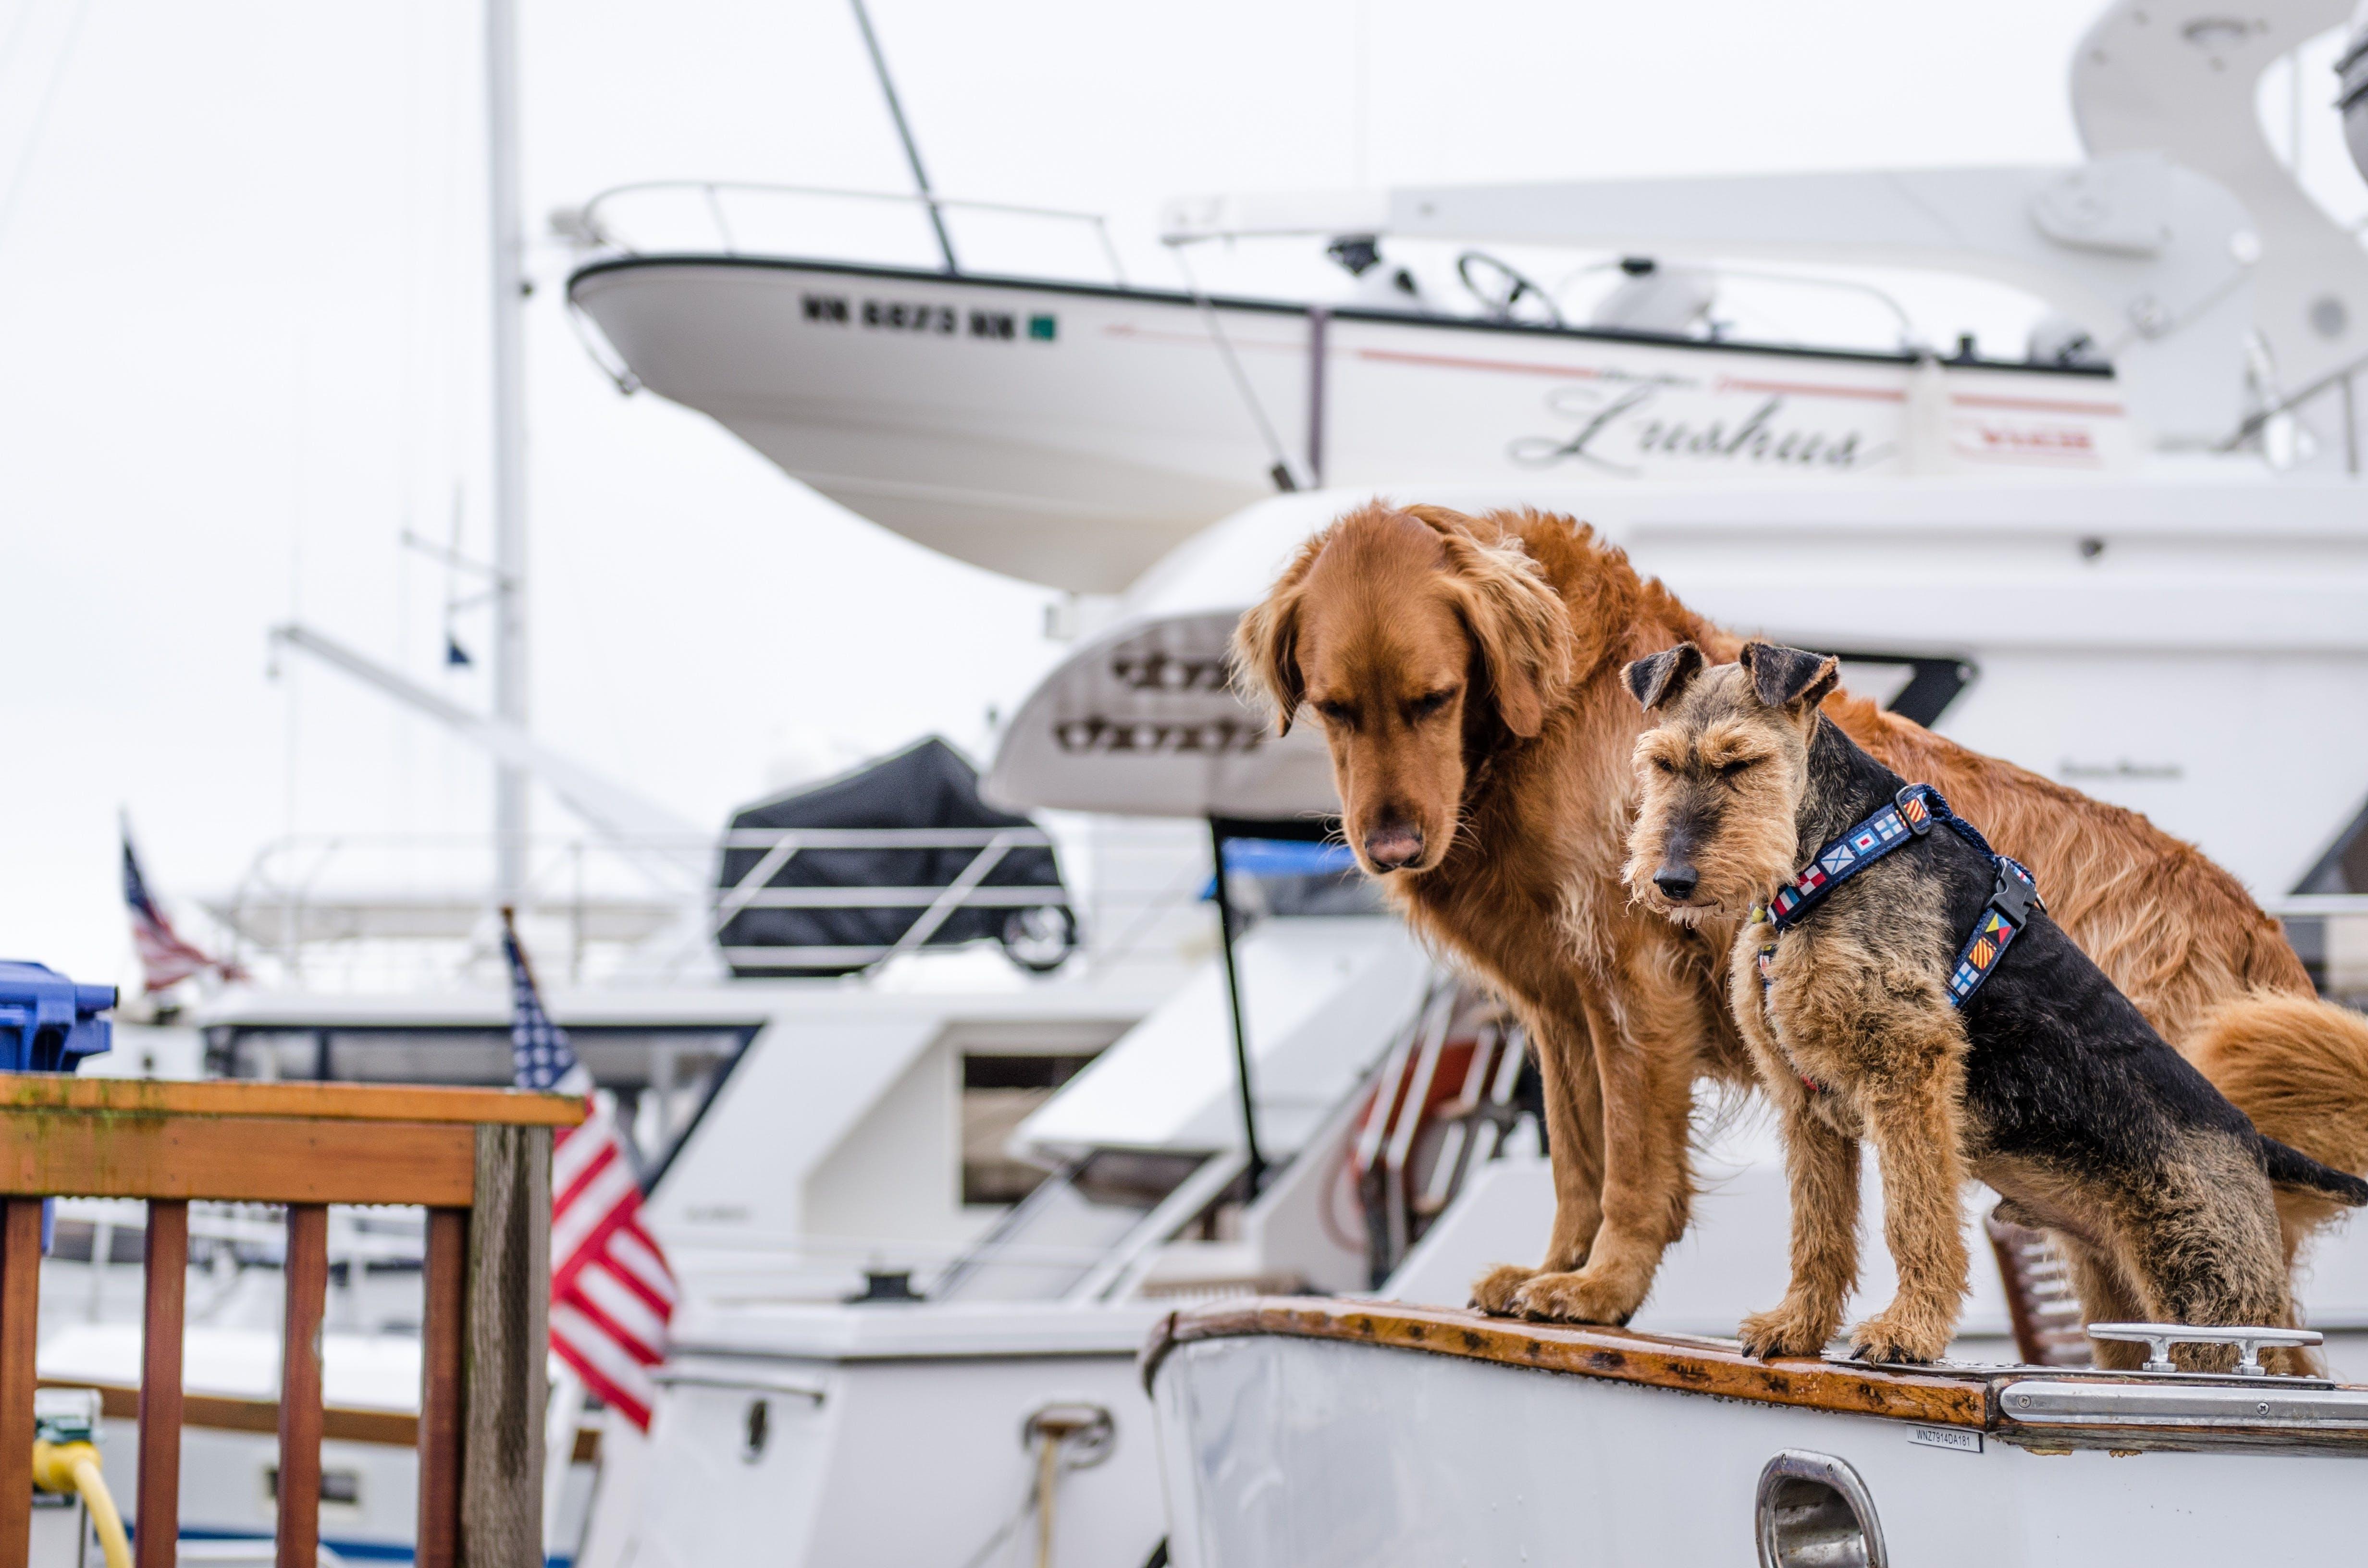 Free stock photo of nature, boats, sailing, animal